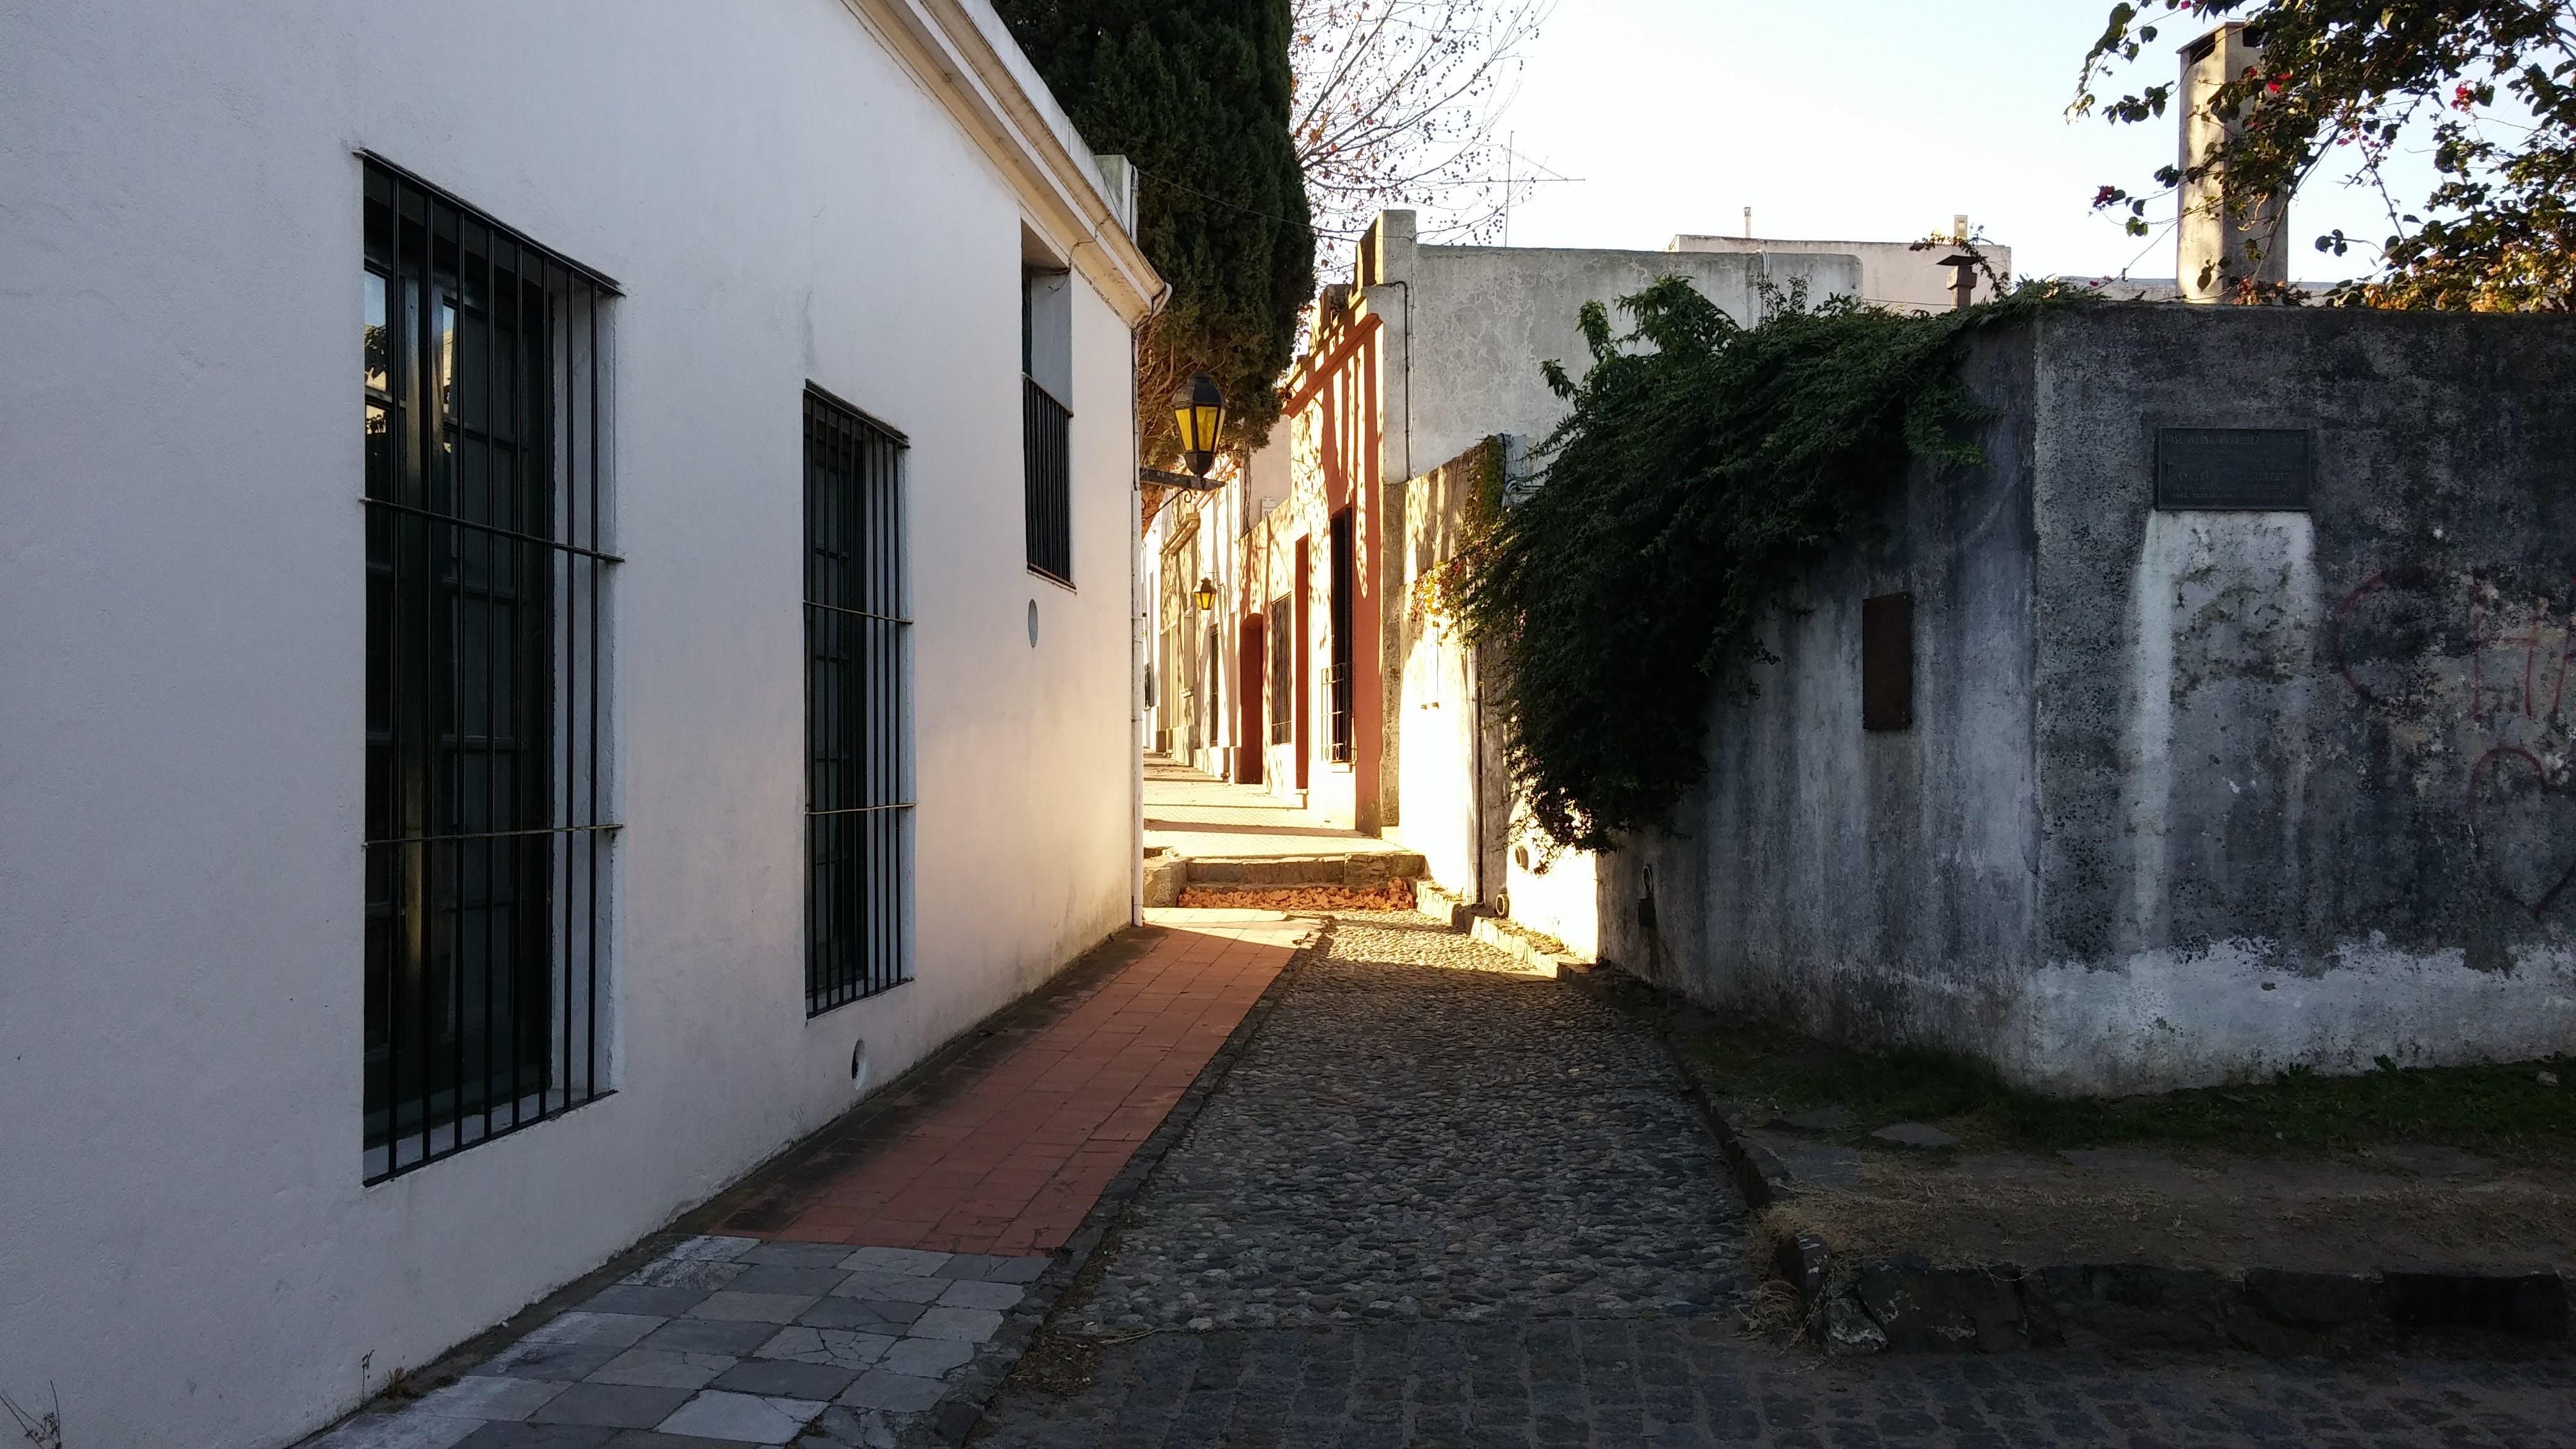 Free stock photo of colonia uruguay colonial city